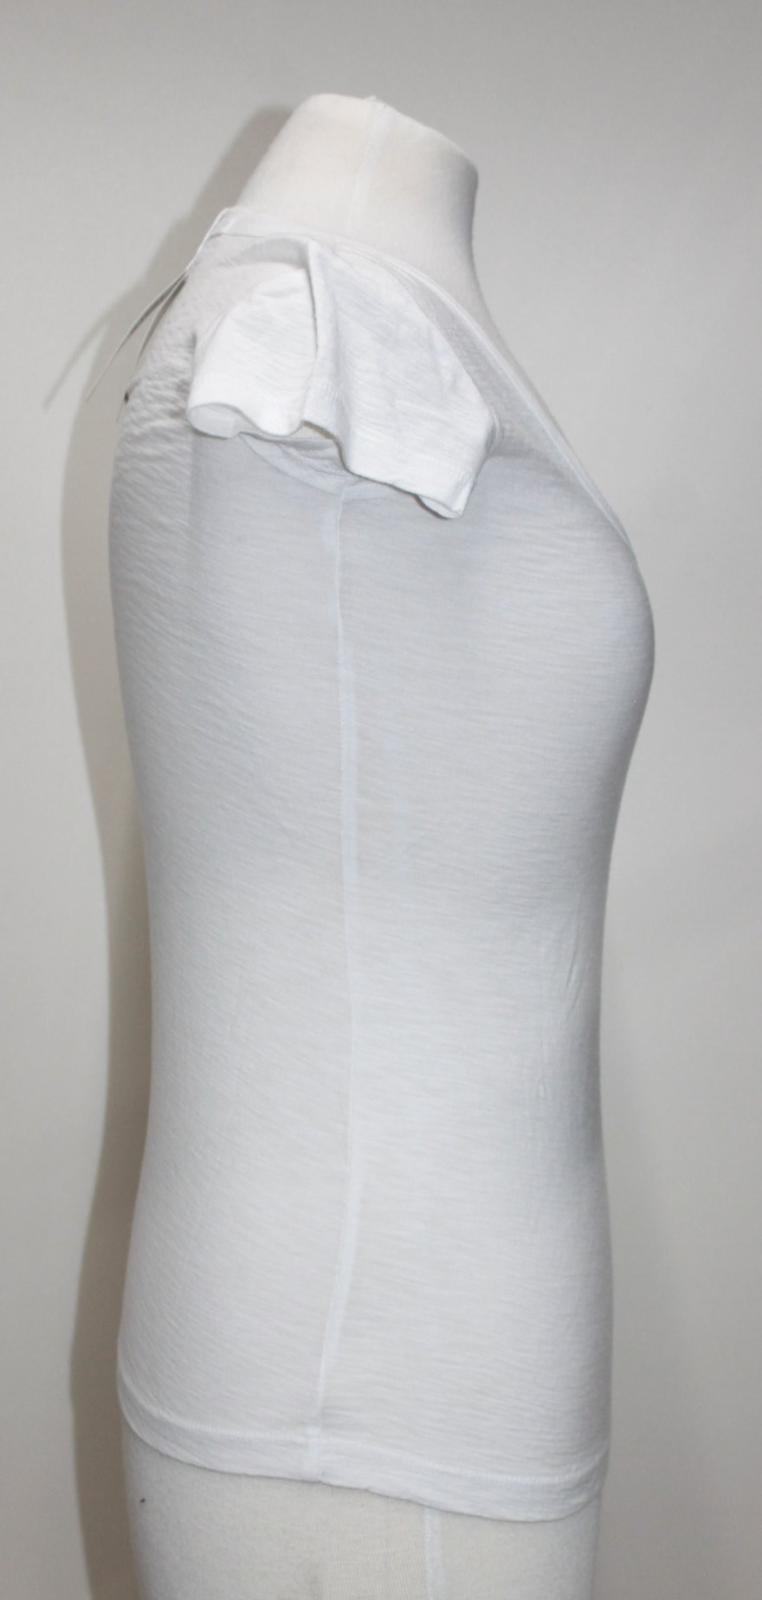 T Us0 bianco Perse shirt James Bnwt misto cotone manica in Uk4 corta qrZCwUq